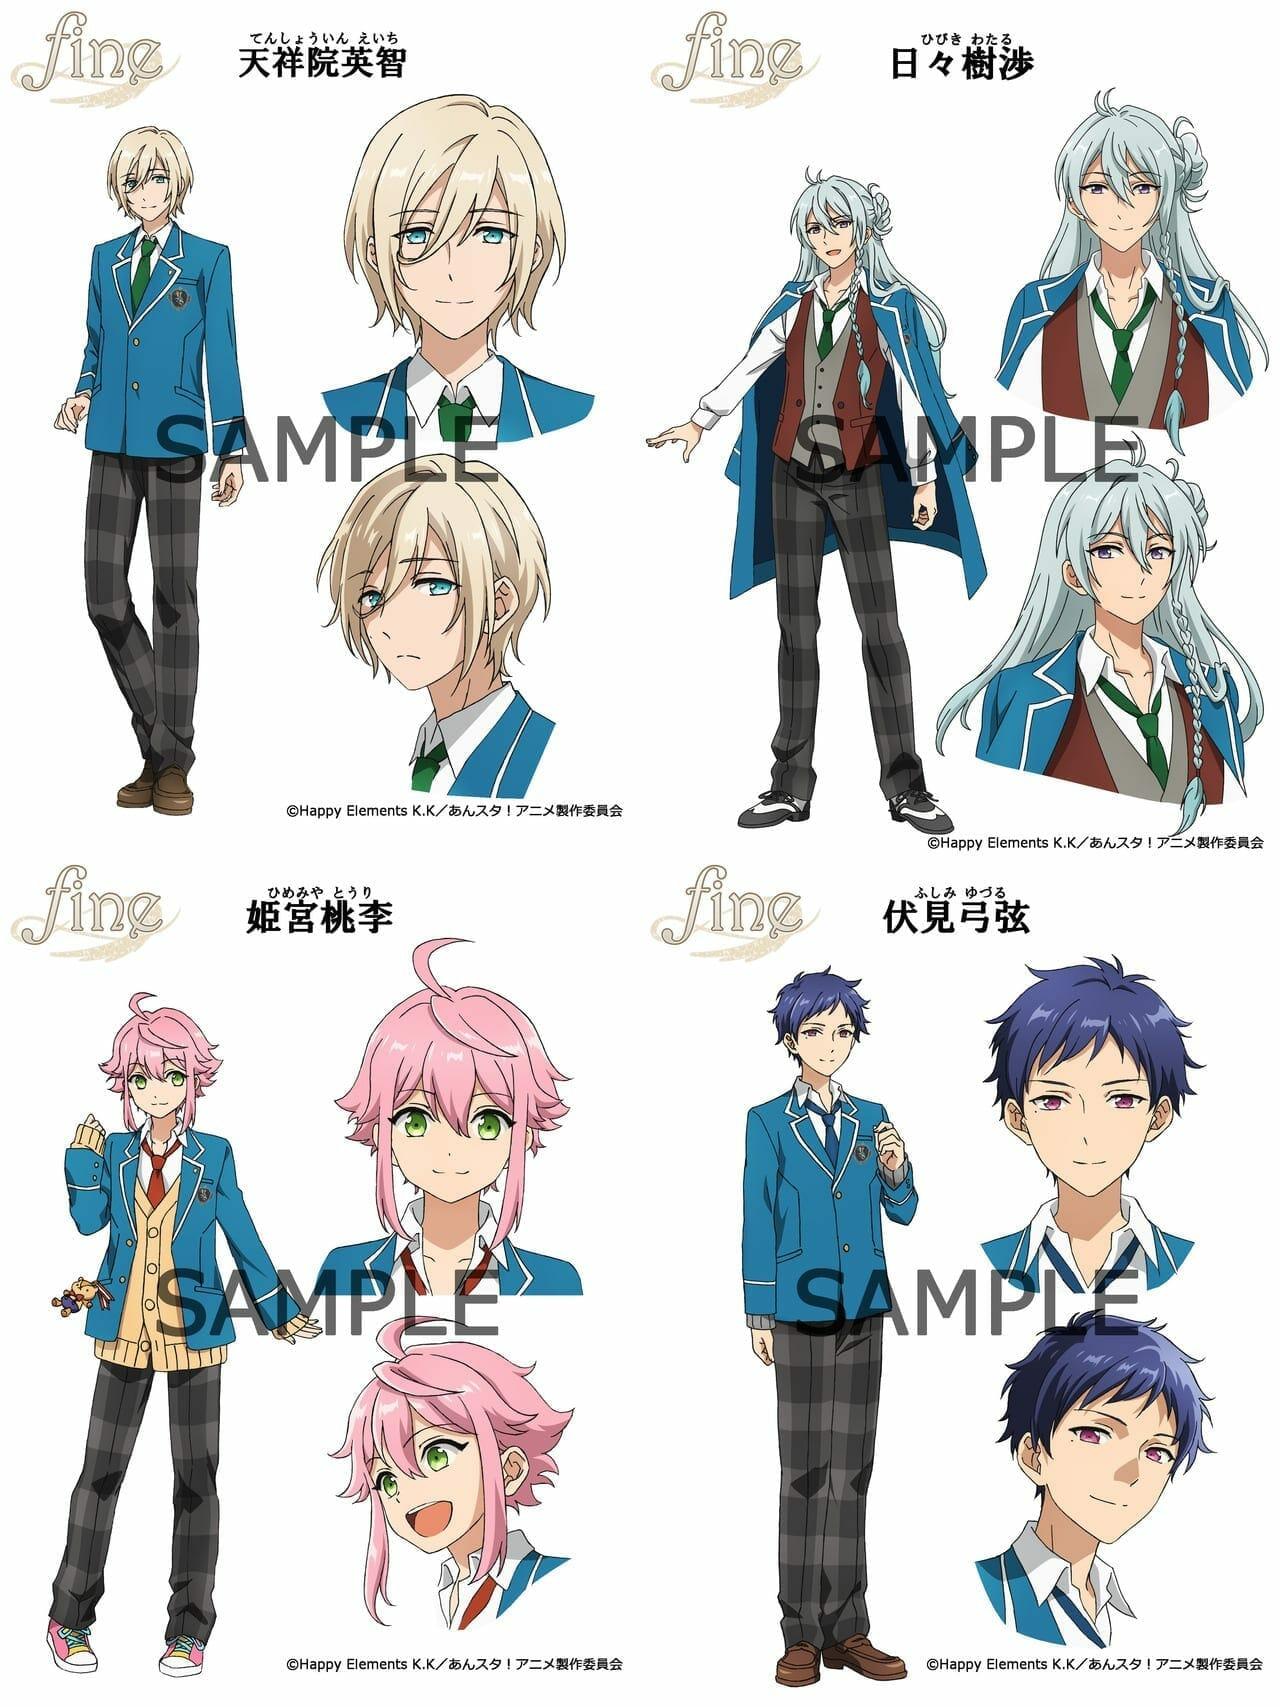 Ensemble Stars! anime character visuals